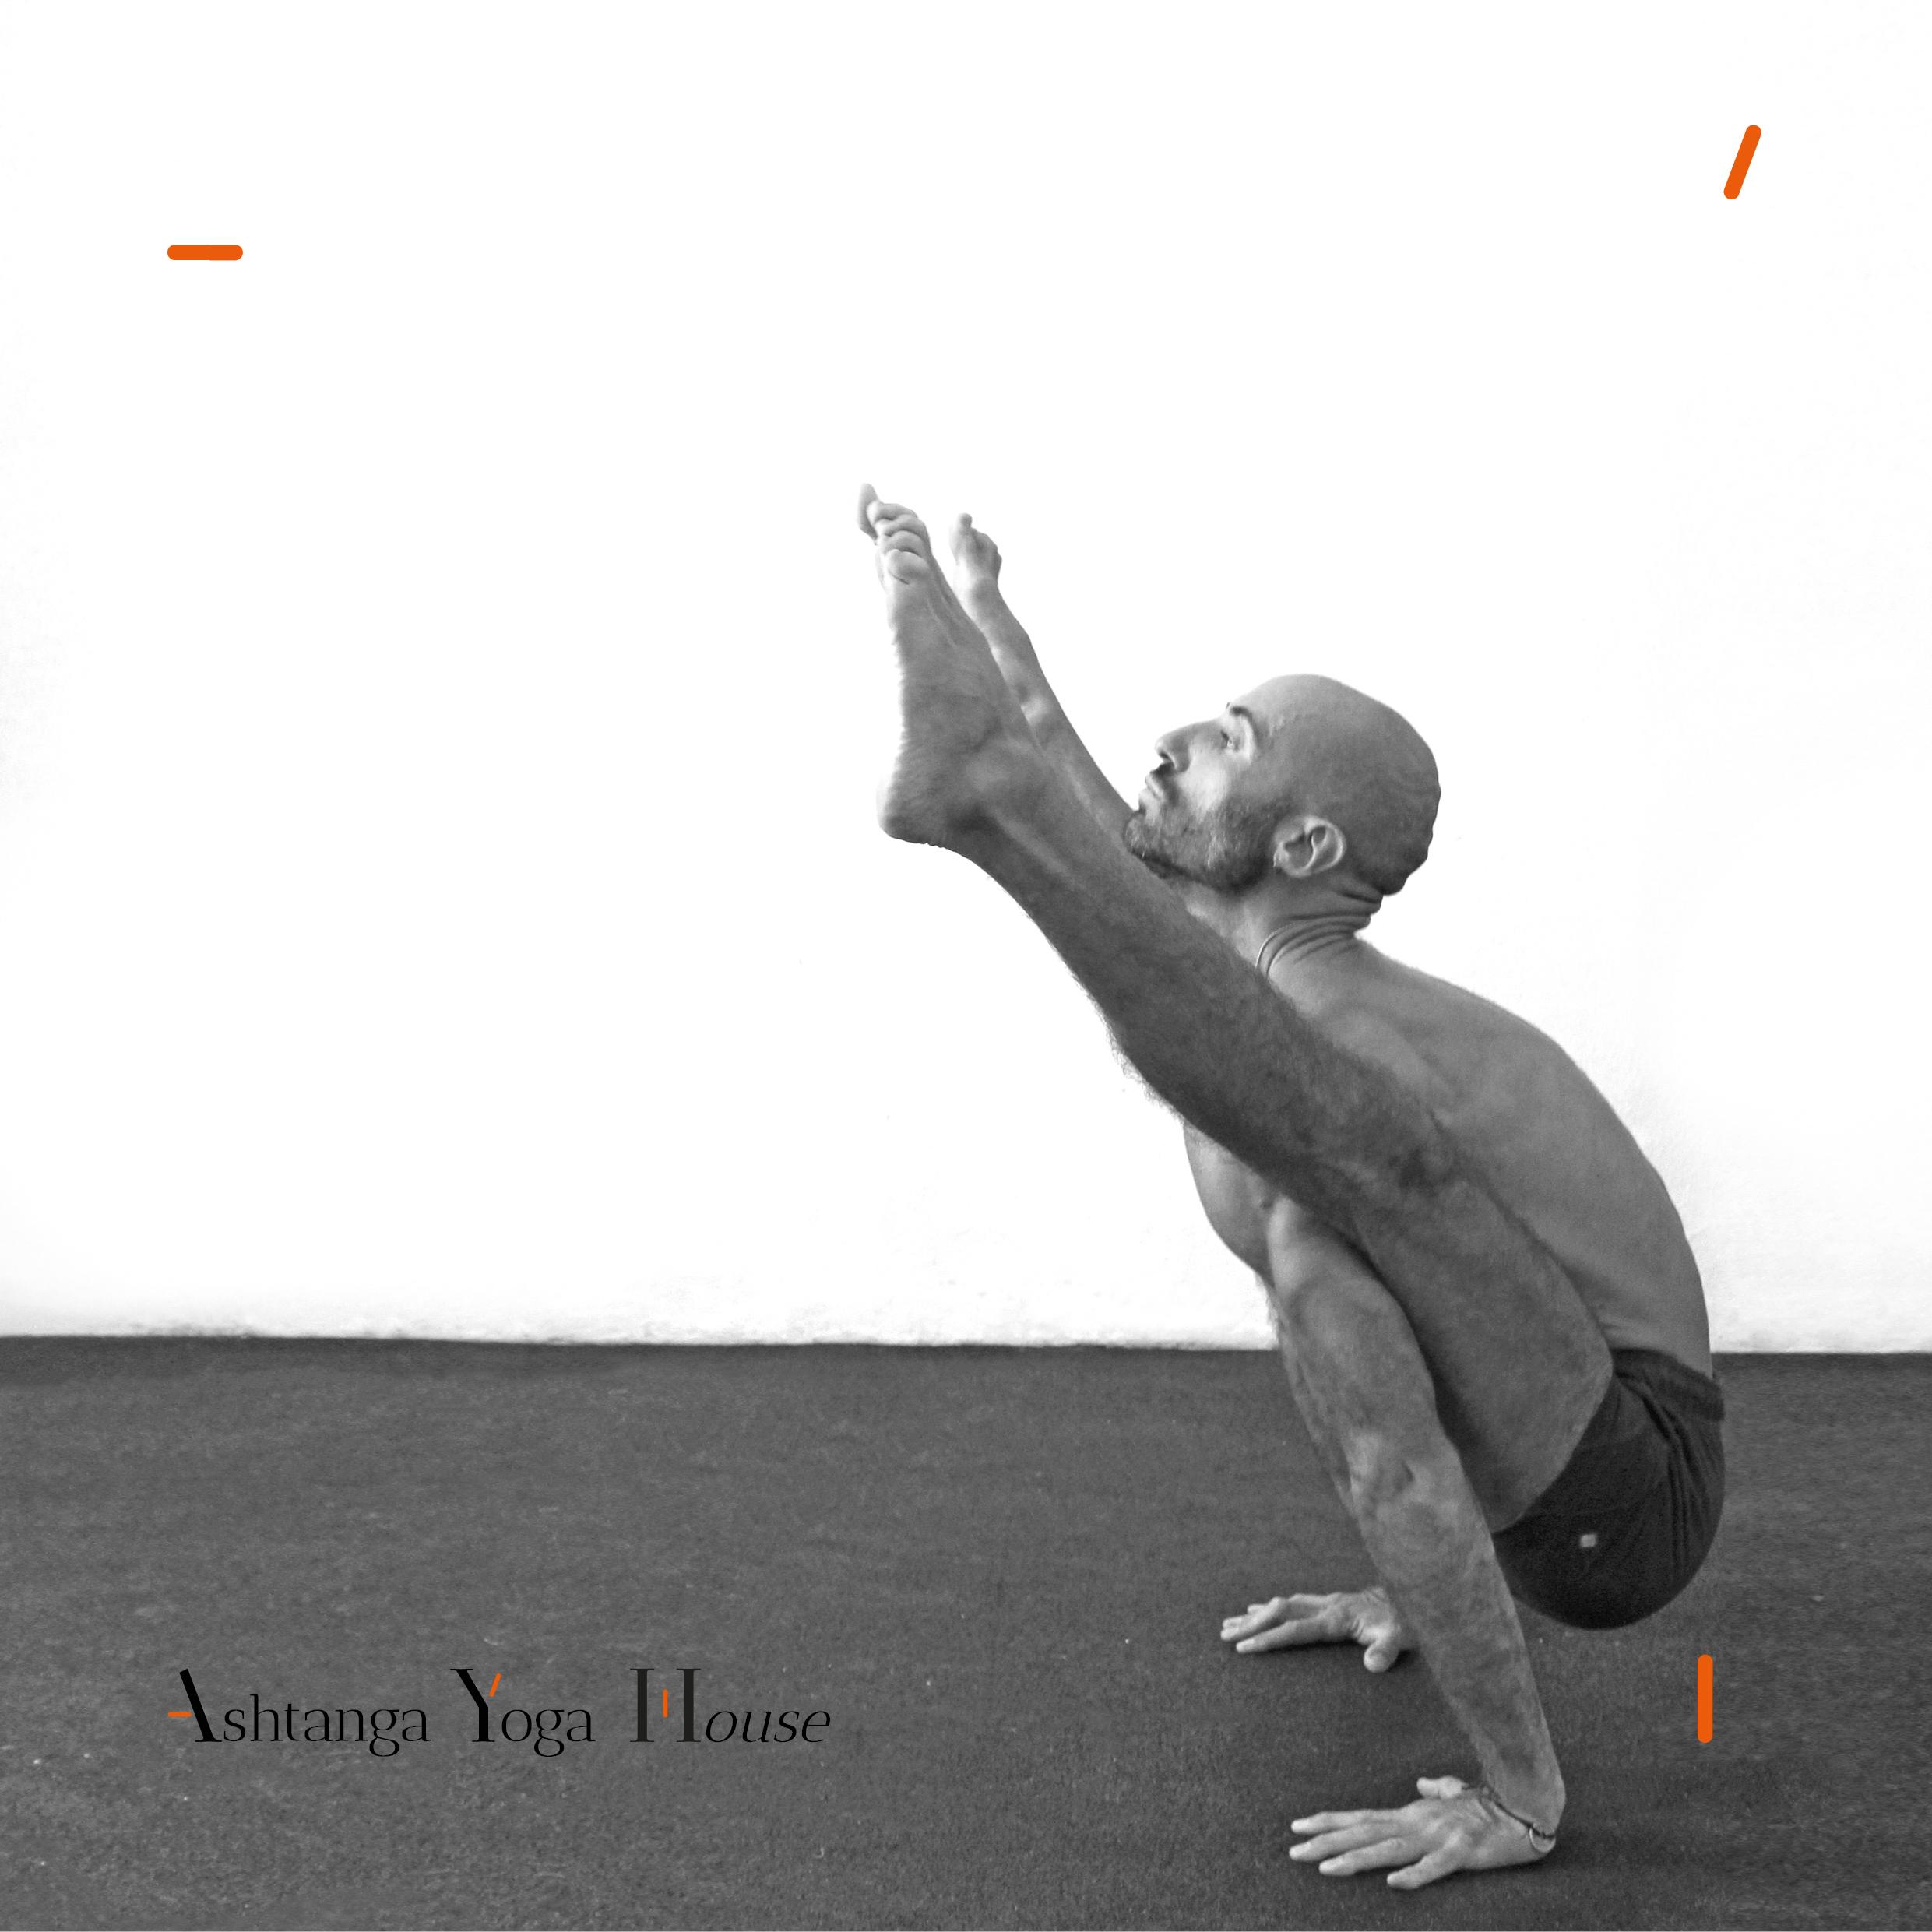 Ashtanga-Yoga-House-Valencia- carlos- matoses jpg